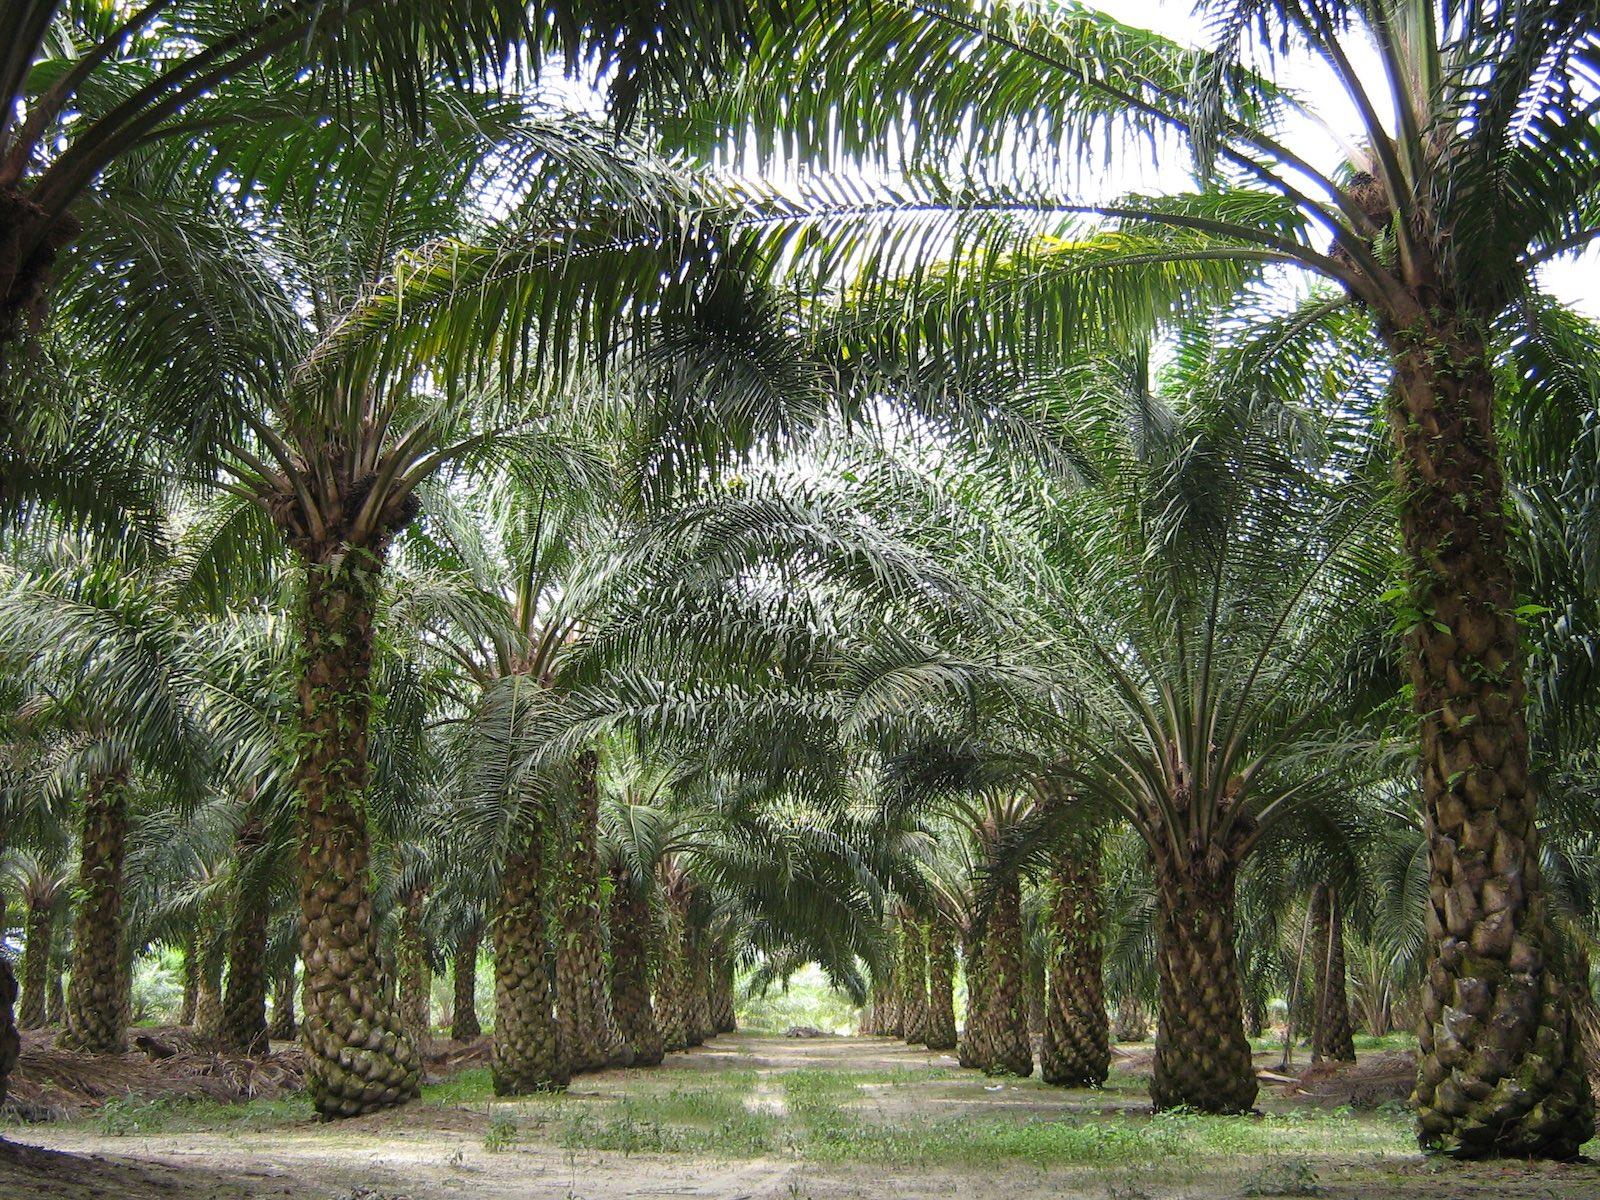 Desde Bucaramanga se buscan nuevos destinos. Mercados mundiales para palma de aceite   EL FRENTE